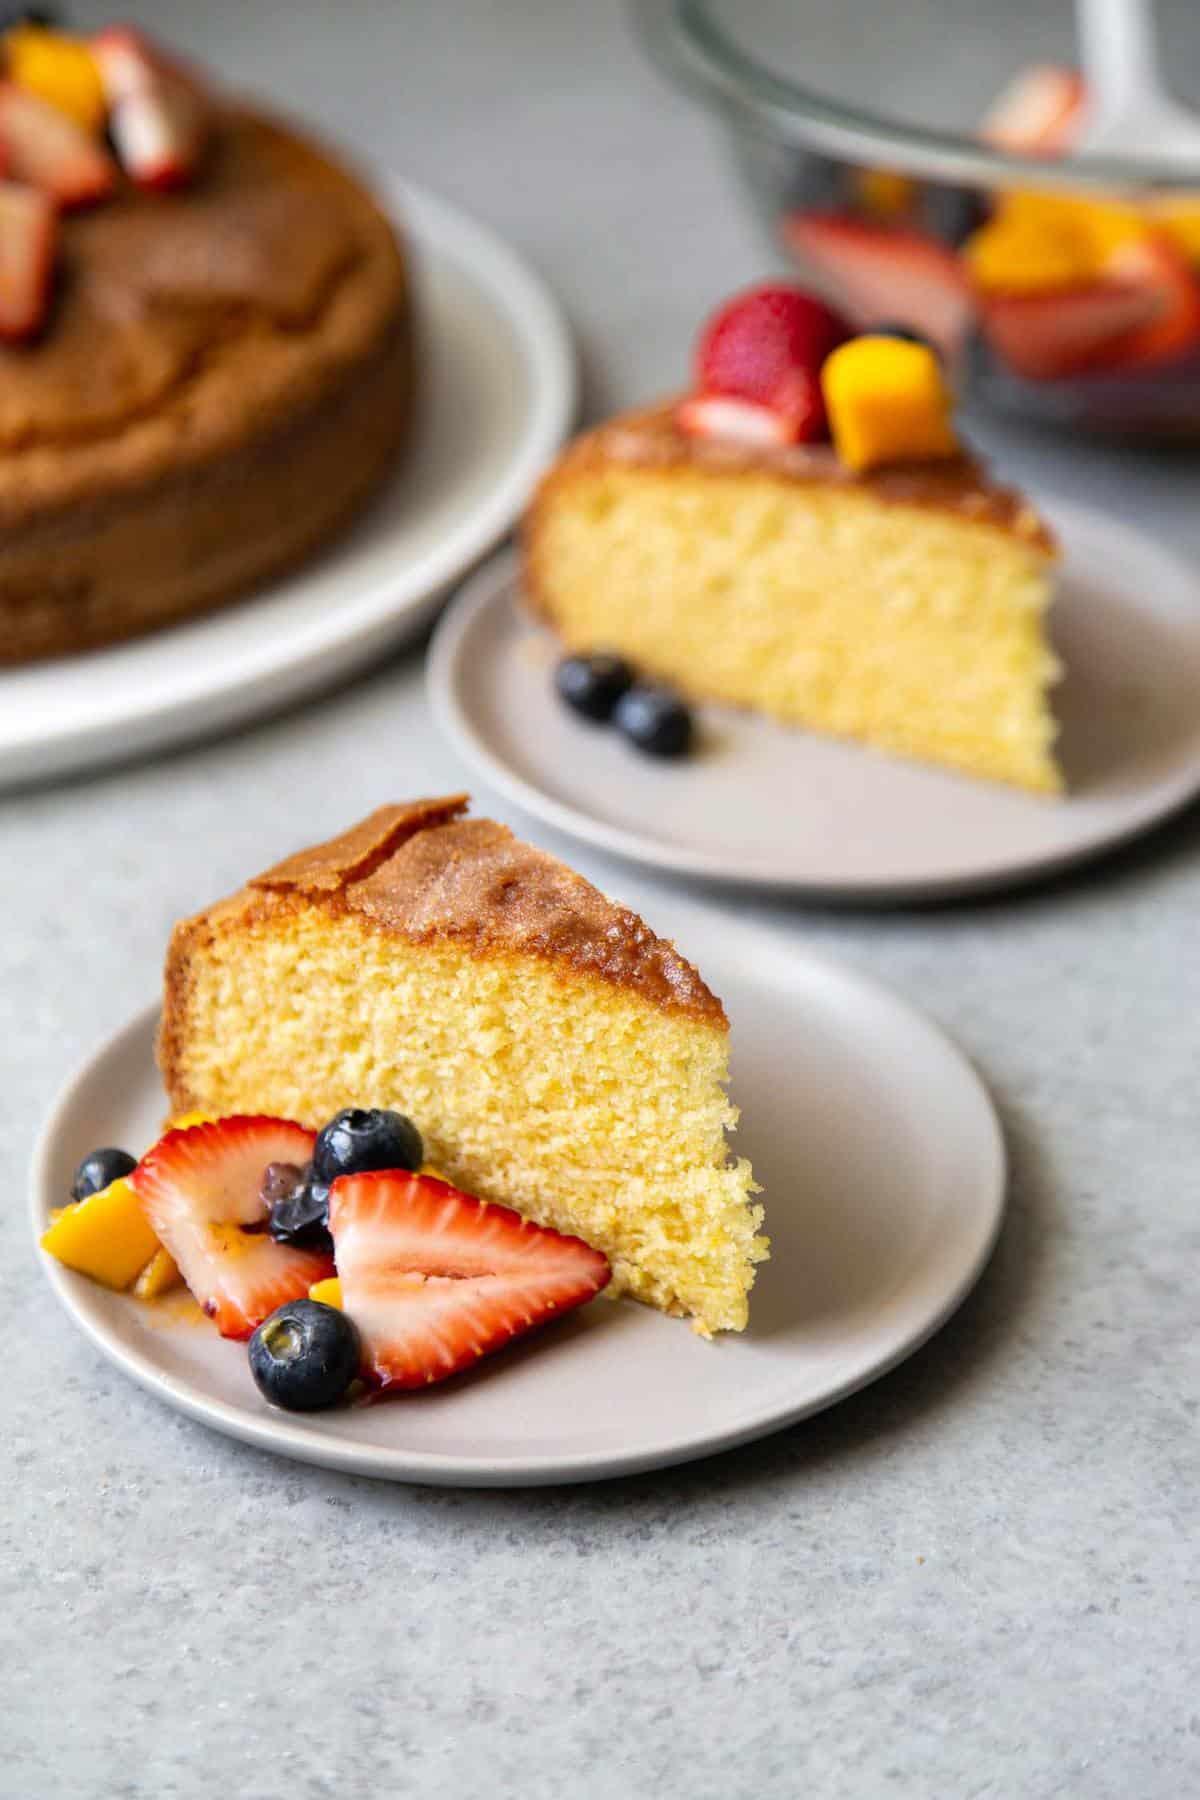 Olive Oil Cake with Fruit Salad